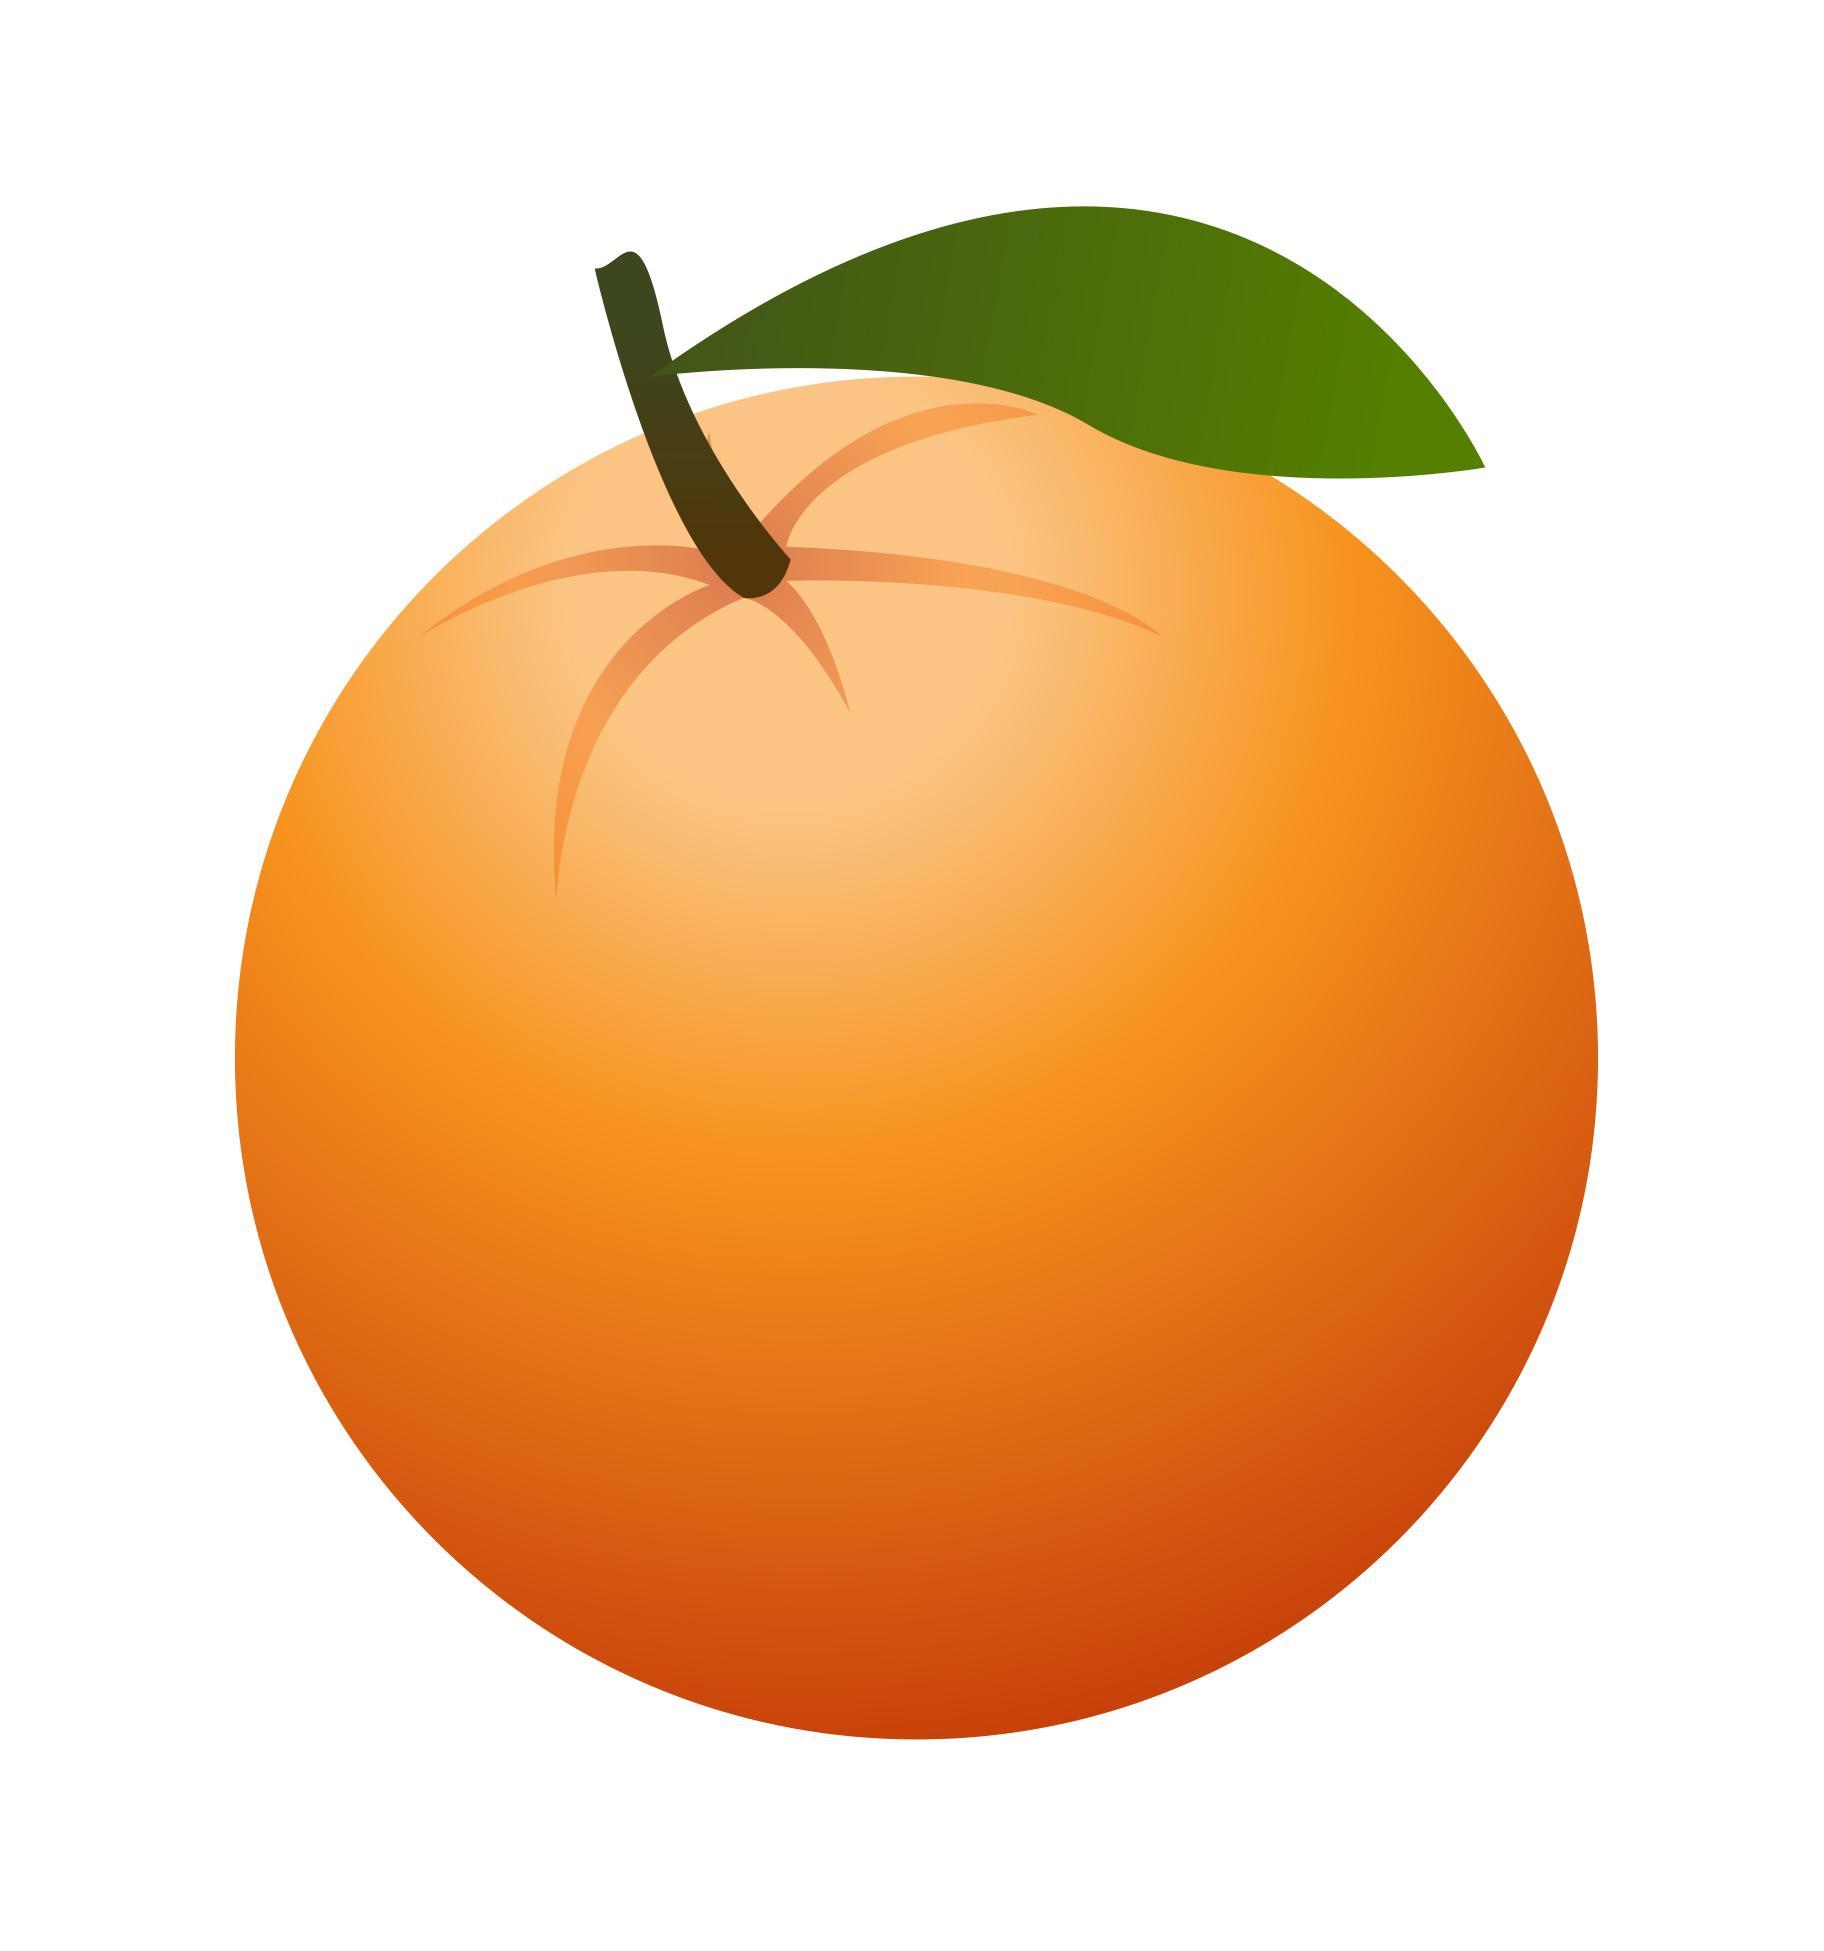 Hd art orange clipart fruit drawing jpg.